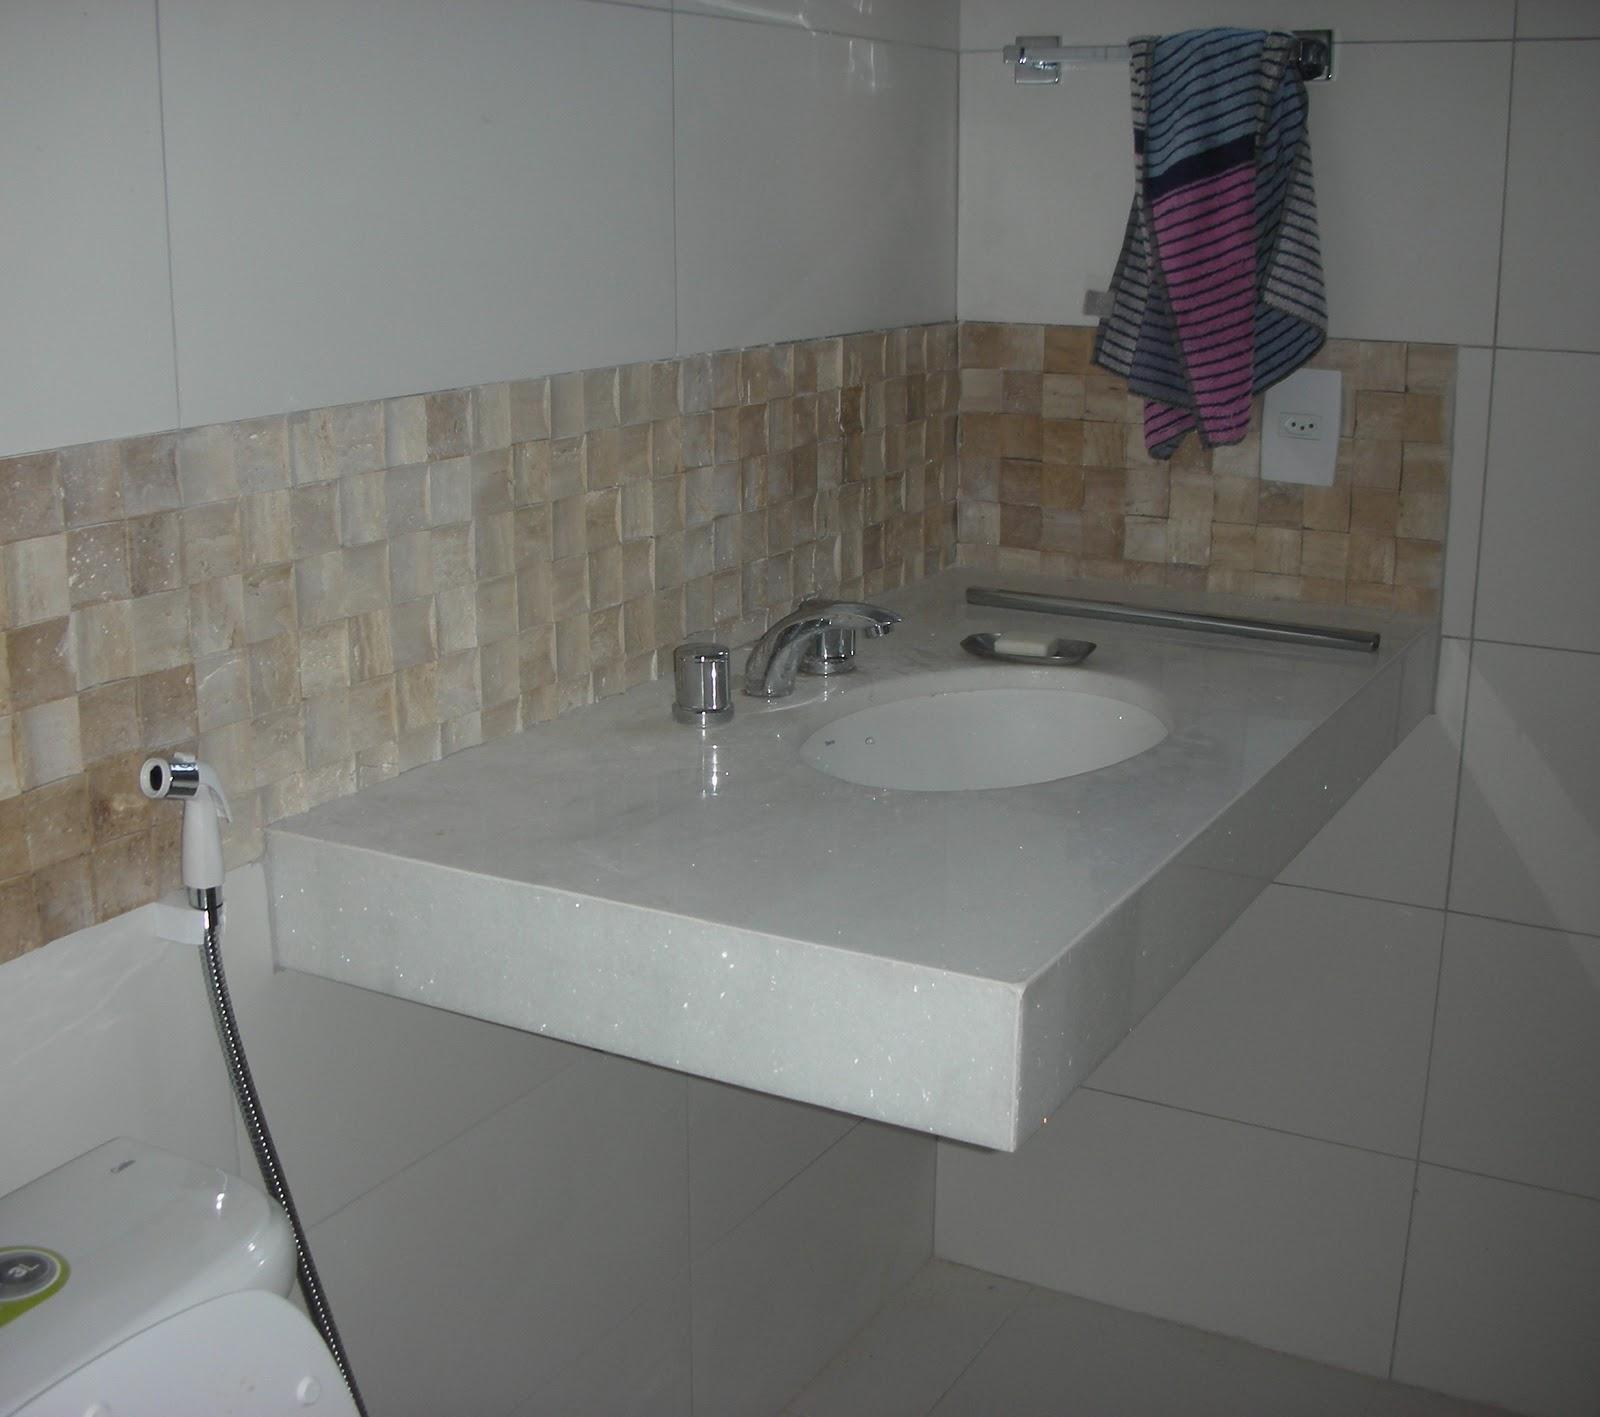 Faixa mosaico mármore travertino sobre bancada #594E44 1600x1417 Bancada Banheiro Marmore Travertino